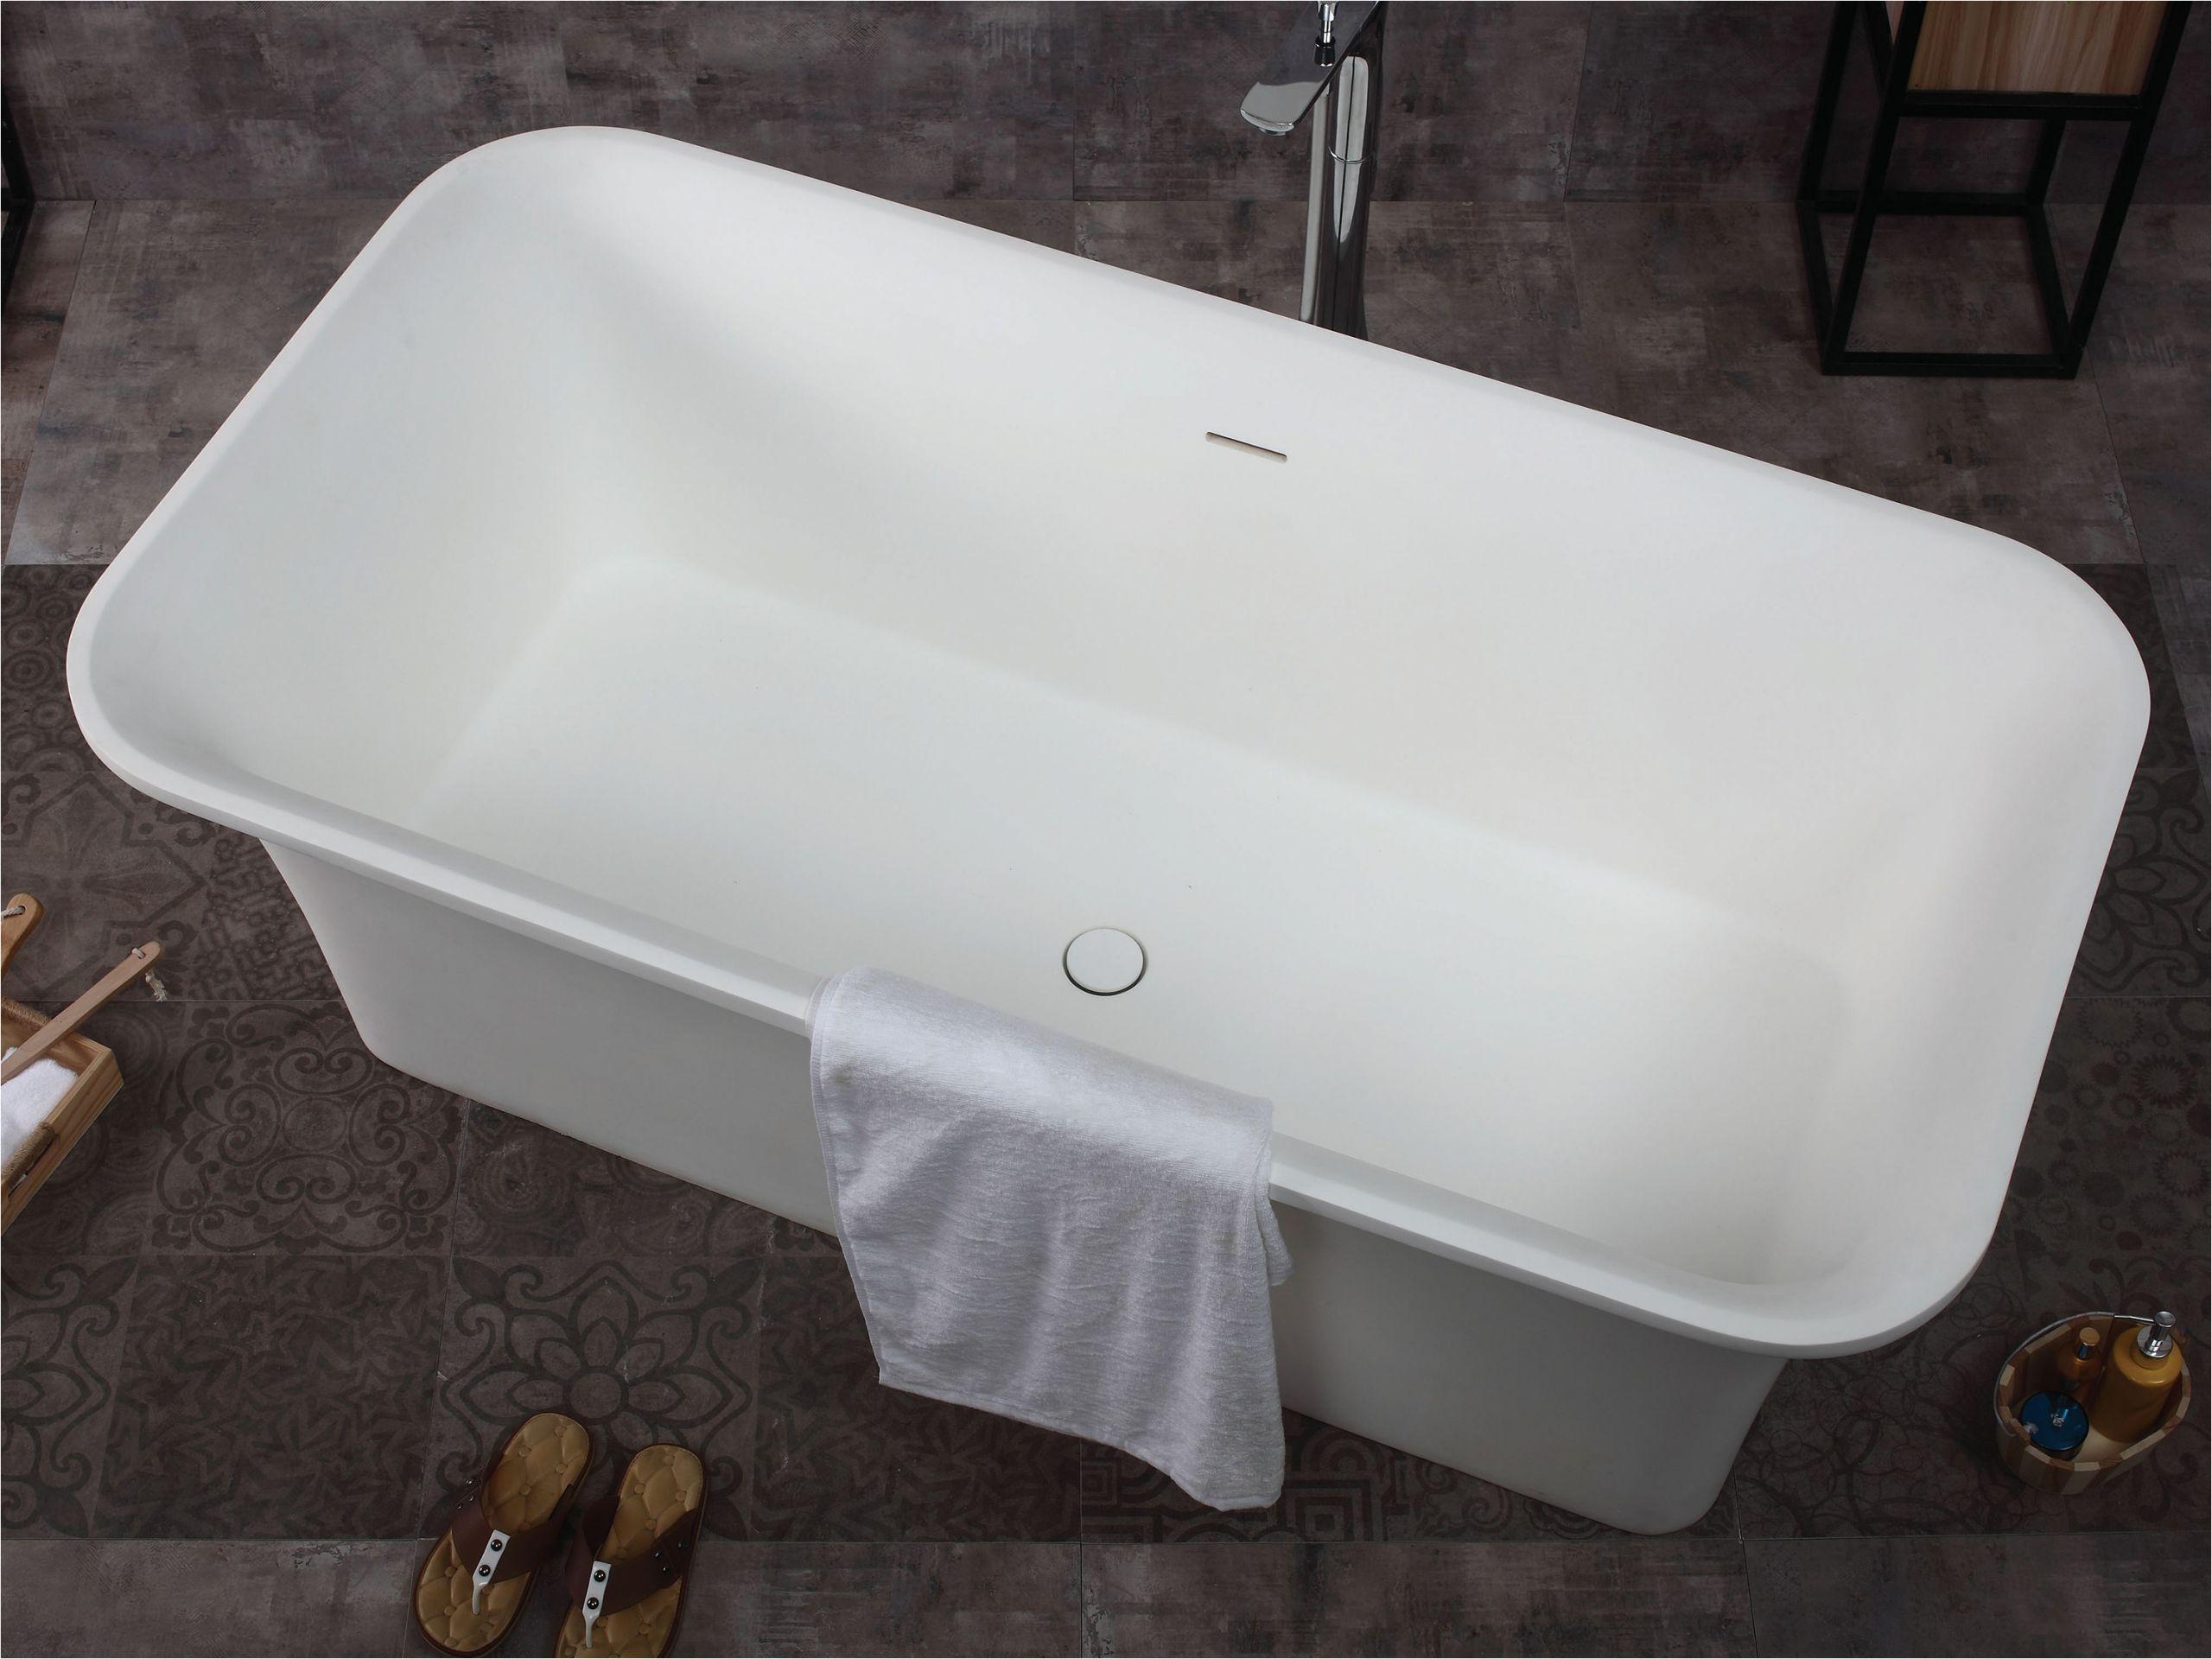 alfi brand ab9942 67 white rectangular solid surface smooth resin soaking bathtub